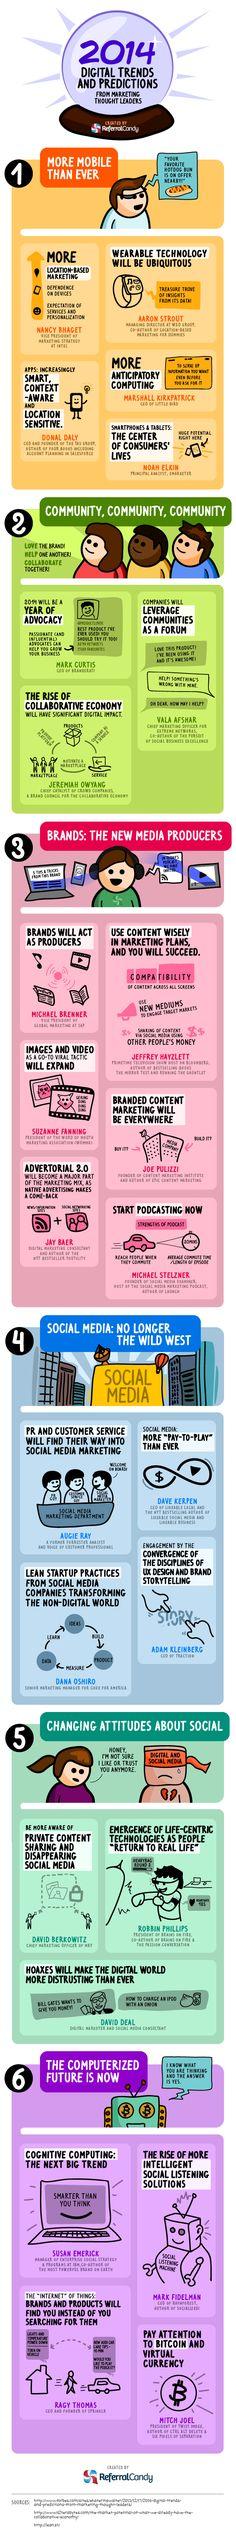 2014 Digital Trends